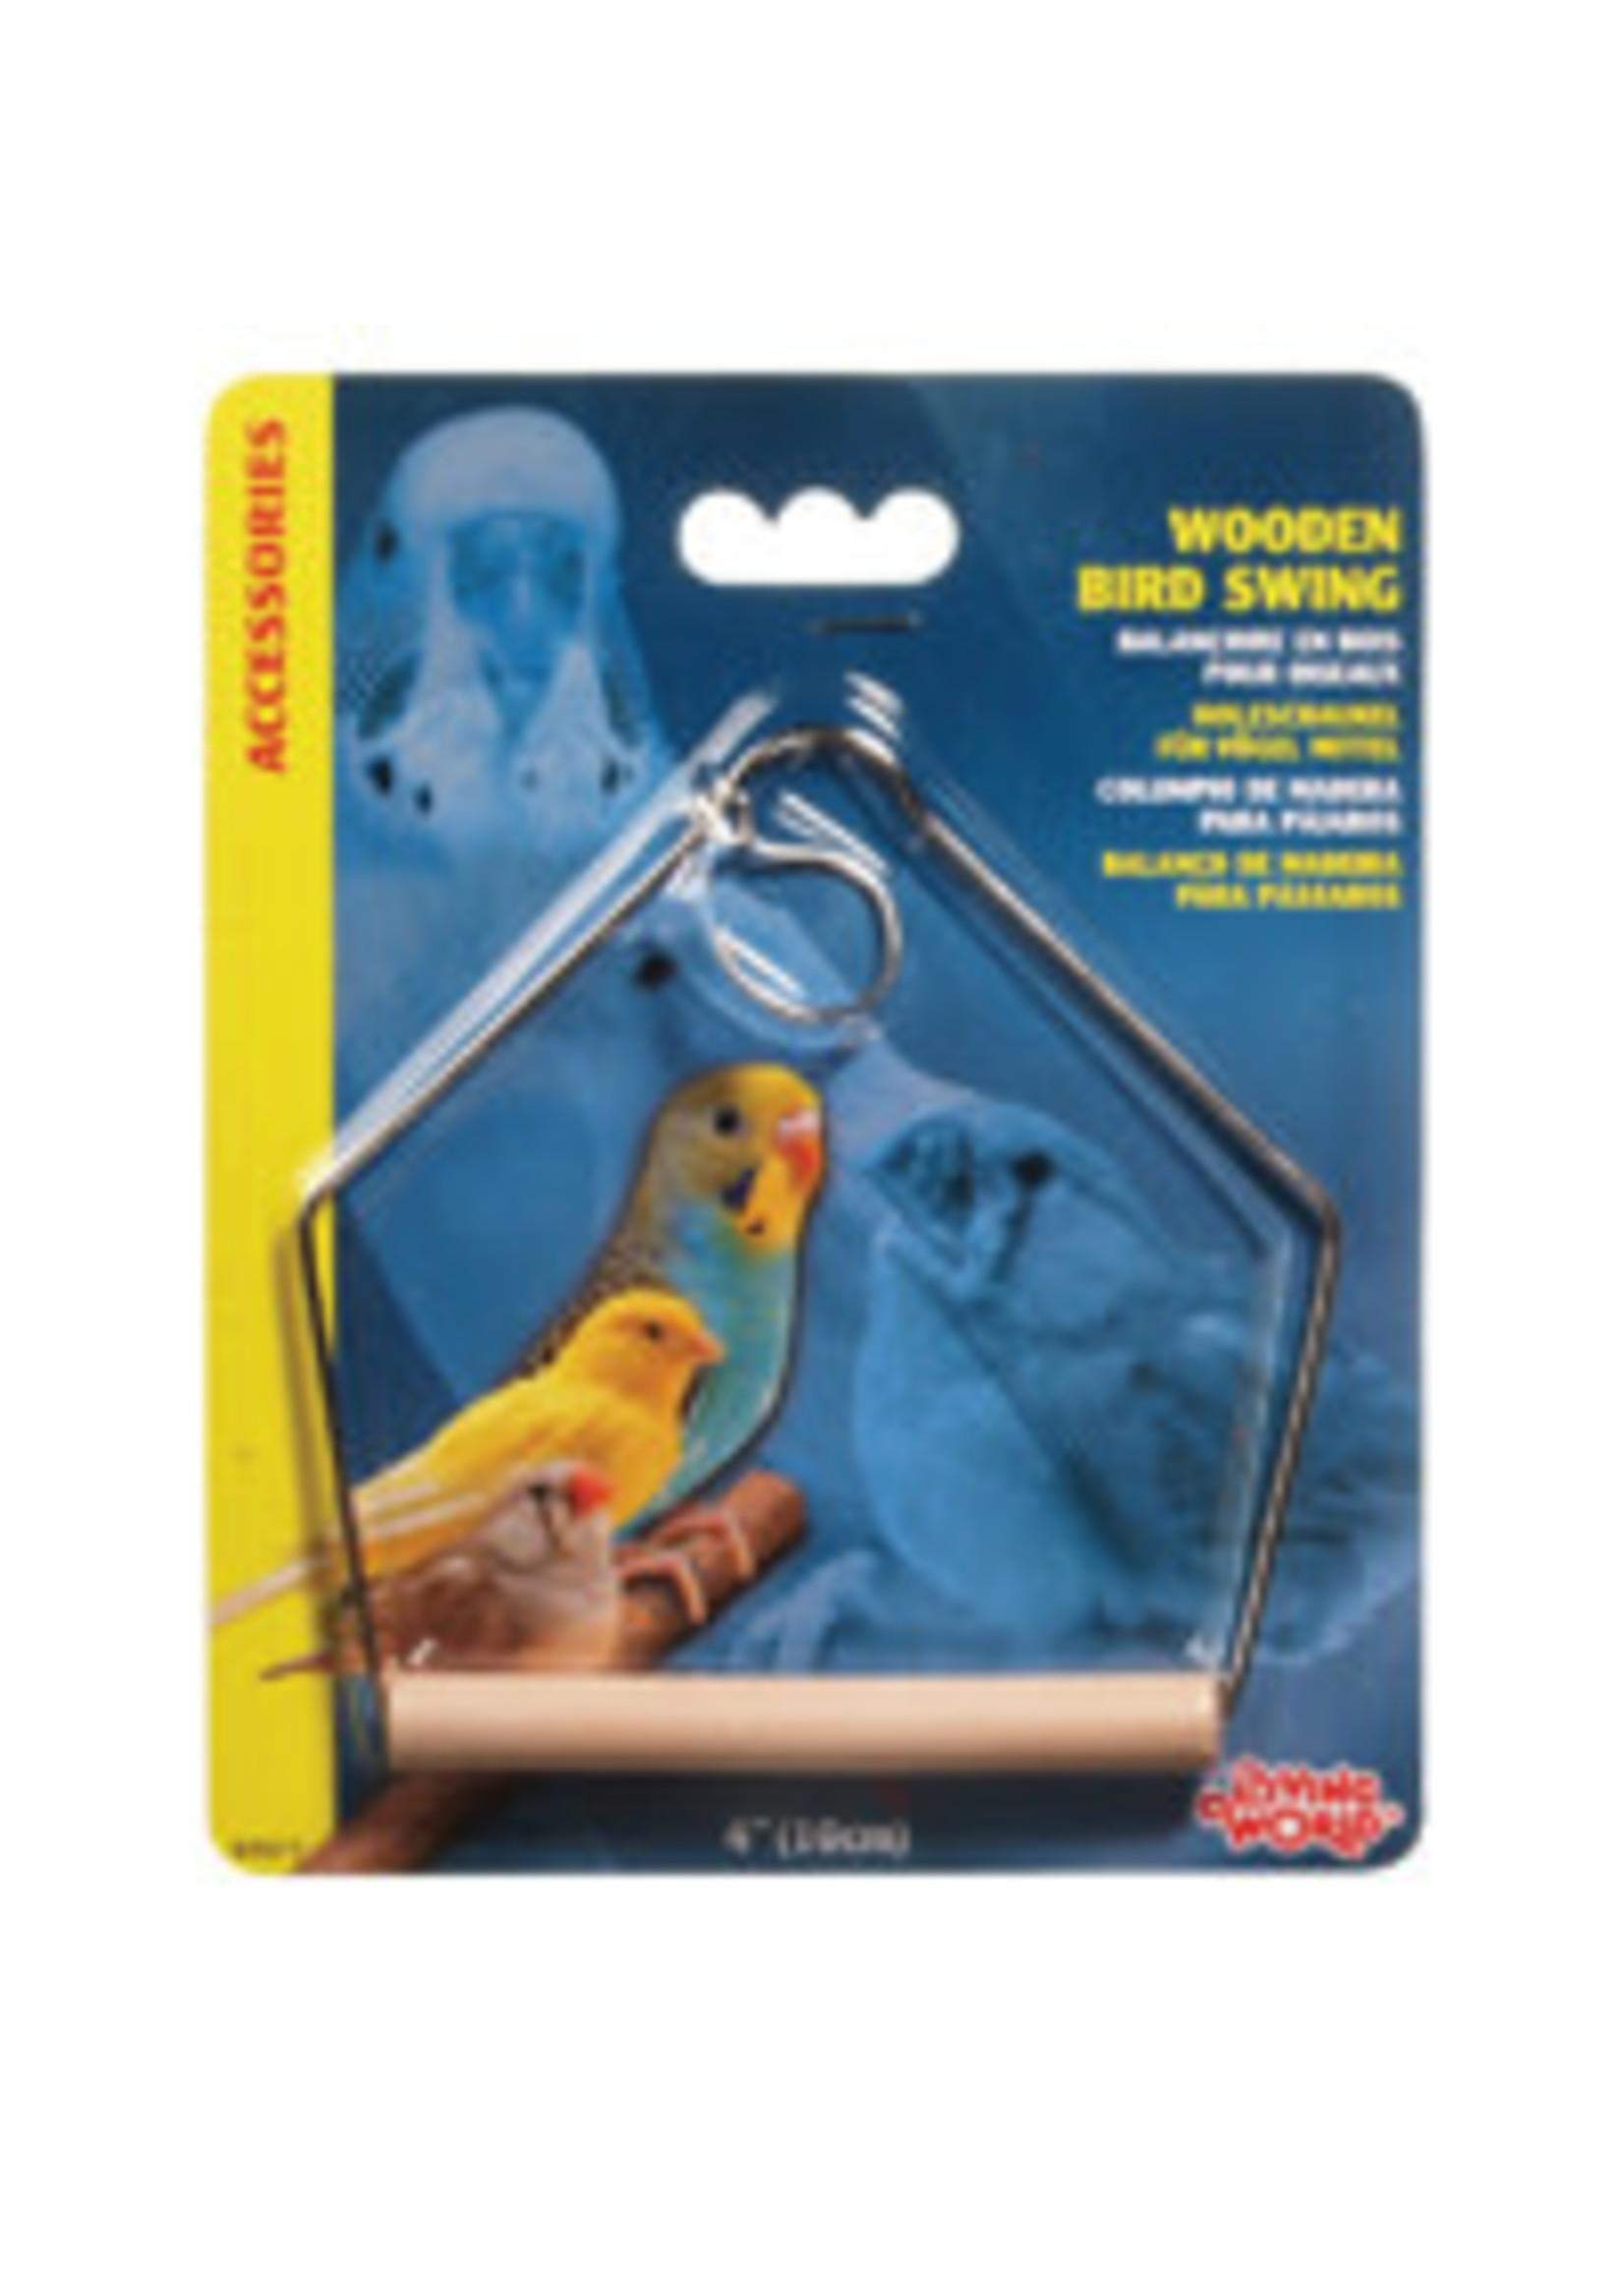 Hagen Living World Wooden Bird Swing - Medium - 10 x 12.5 cm (4 x 5 in)